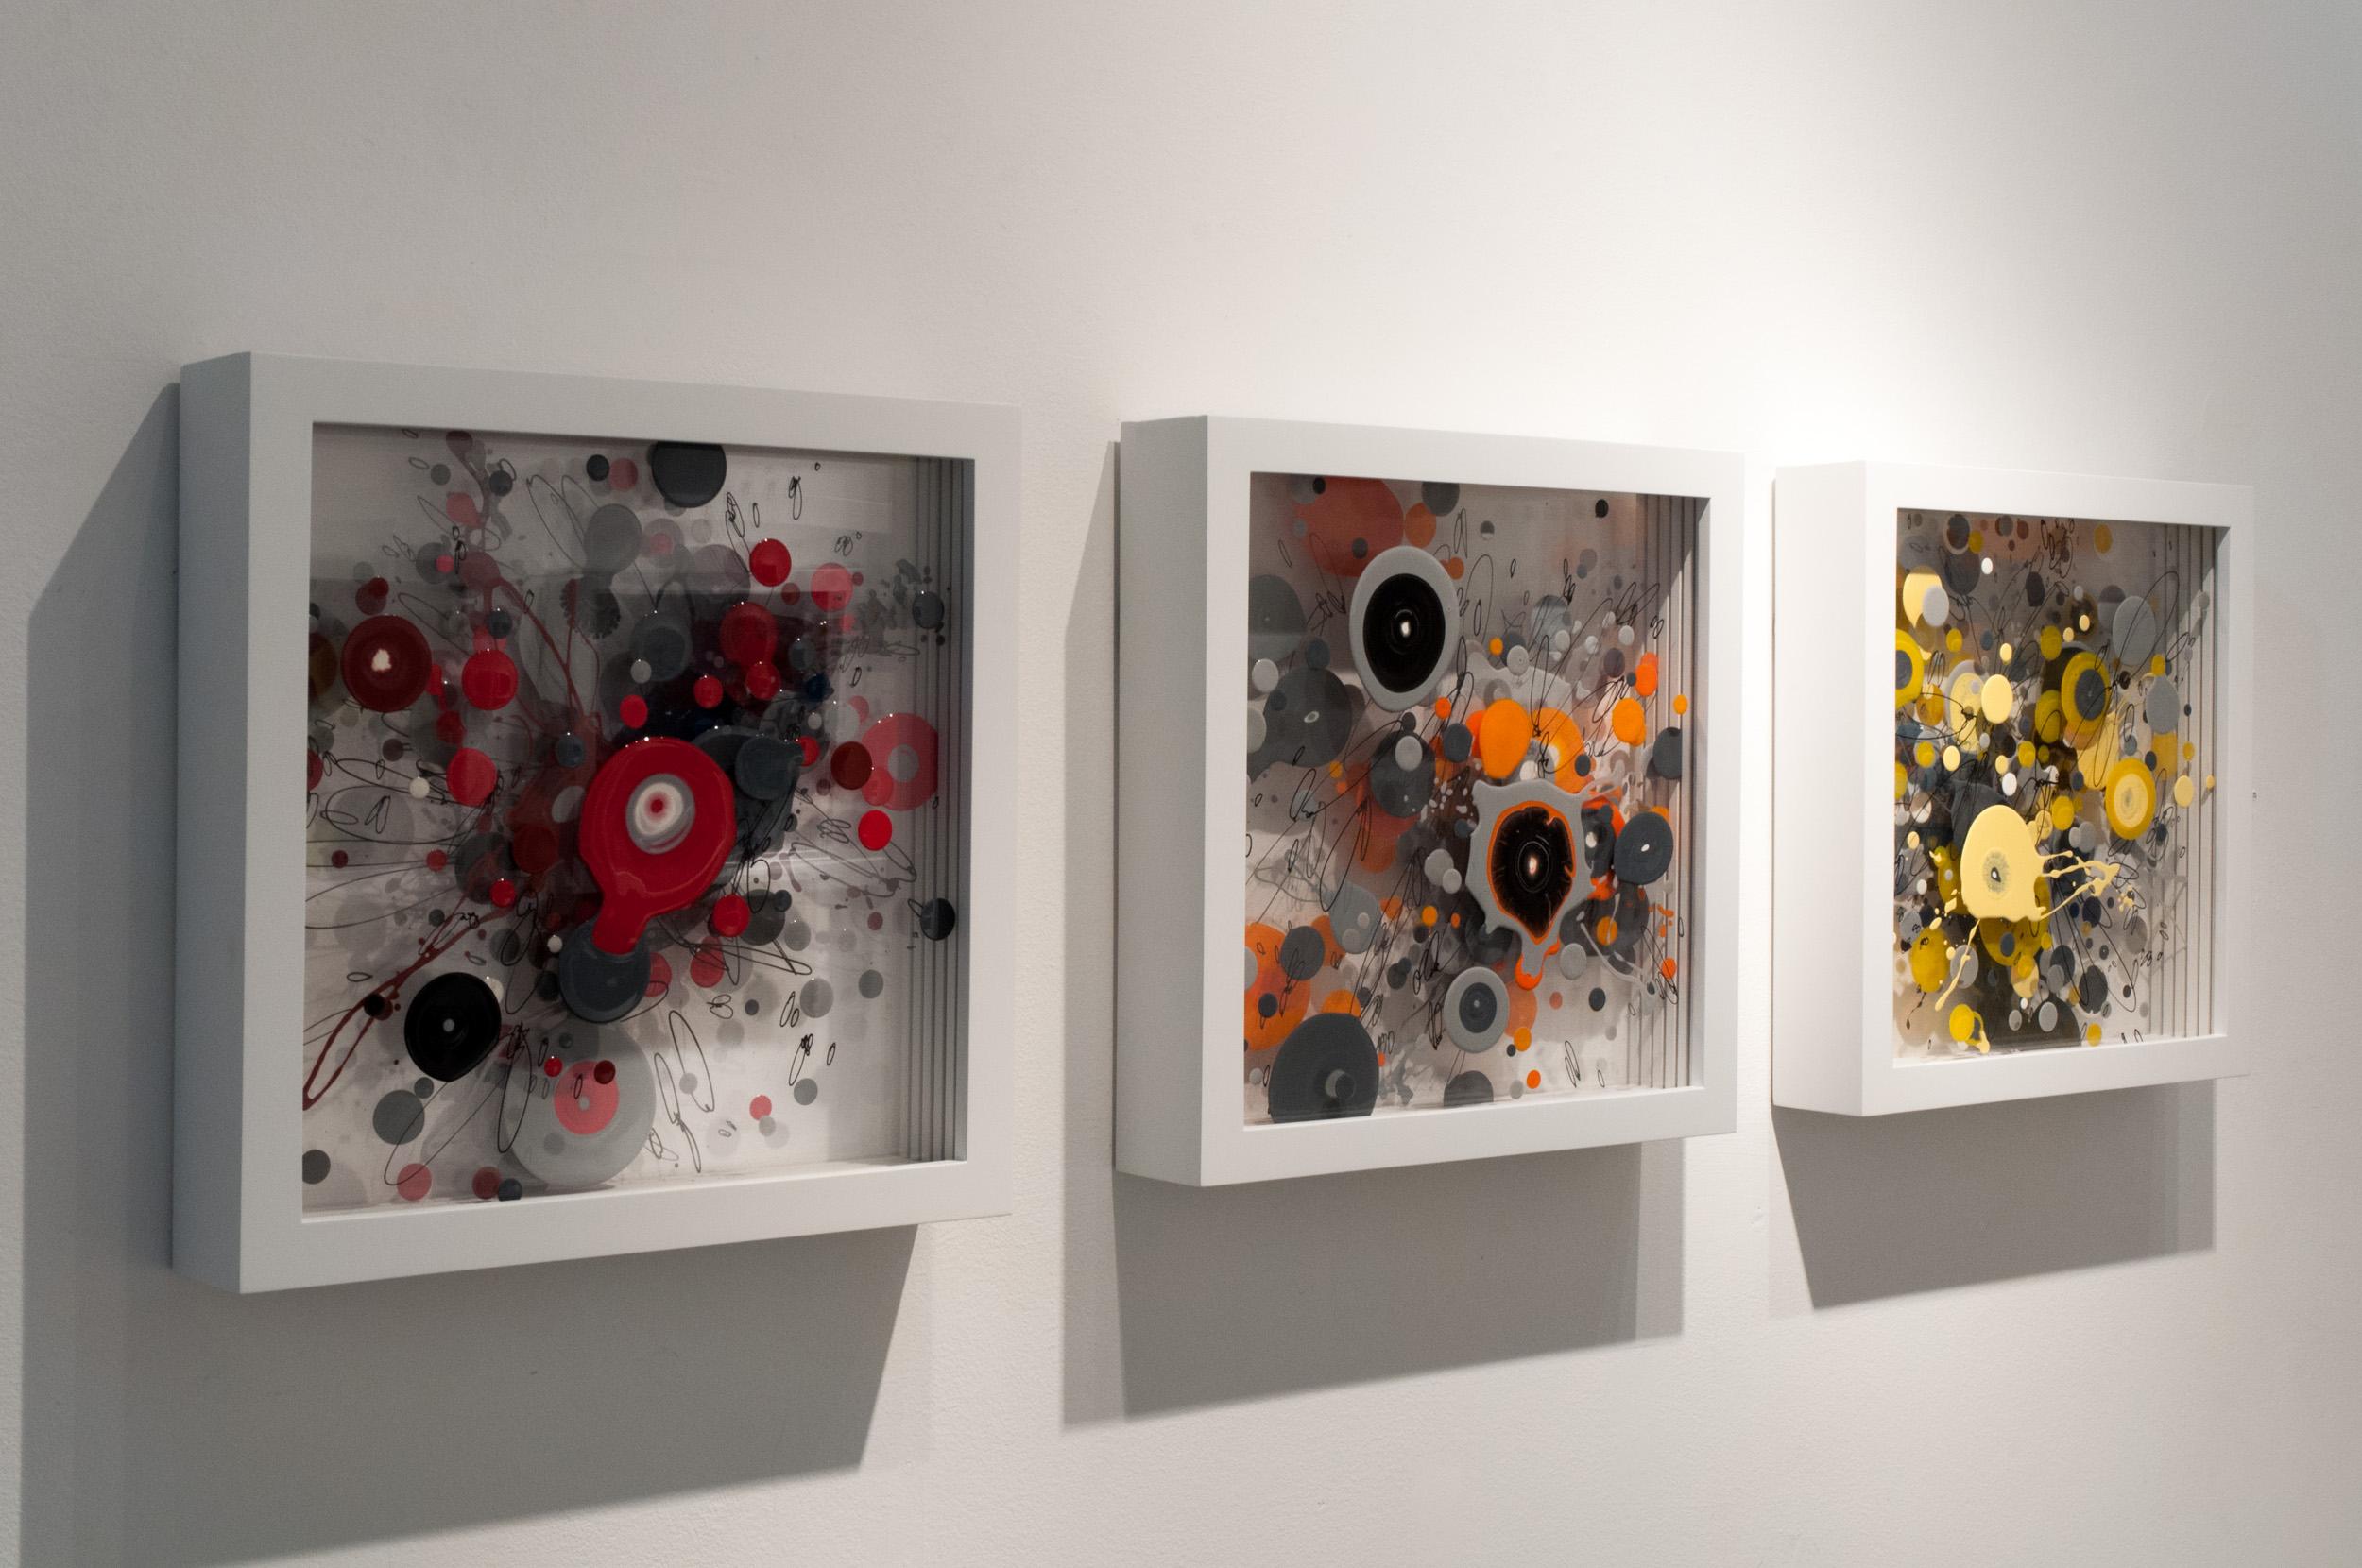 "(left to right) ""CPO3"" WGR 058G, ""CPO4"" WGR 059G, & ""CPO5"" WGR 060G, enamel on layered plexiglass. 14 x 14 x 3 inches."